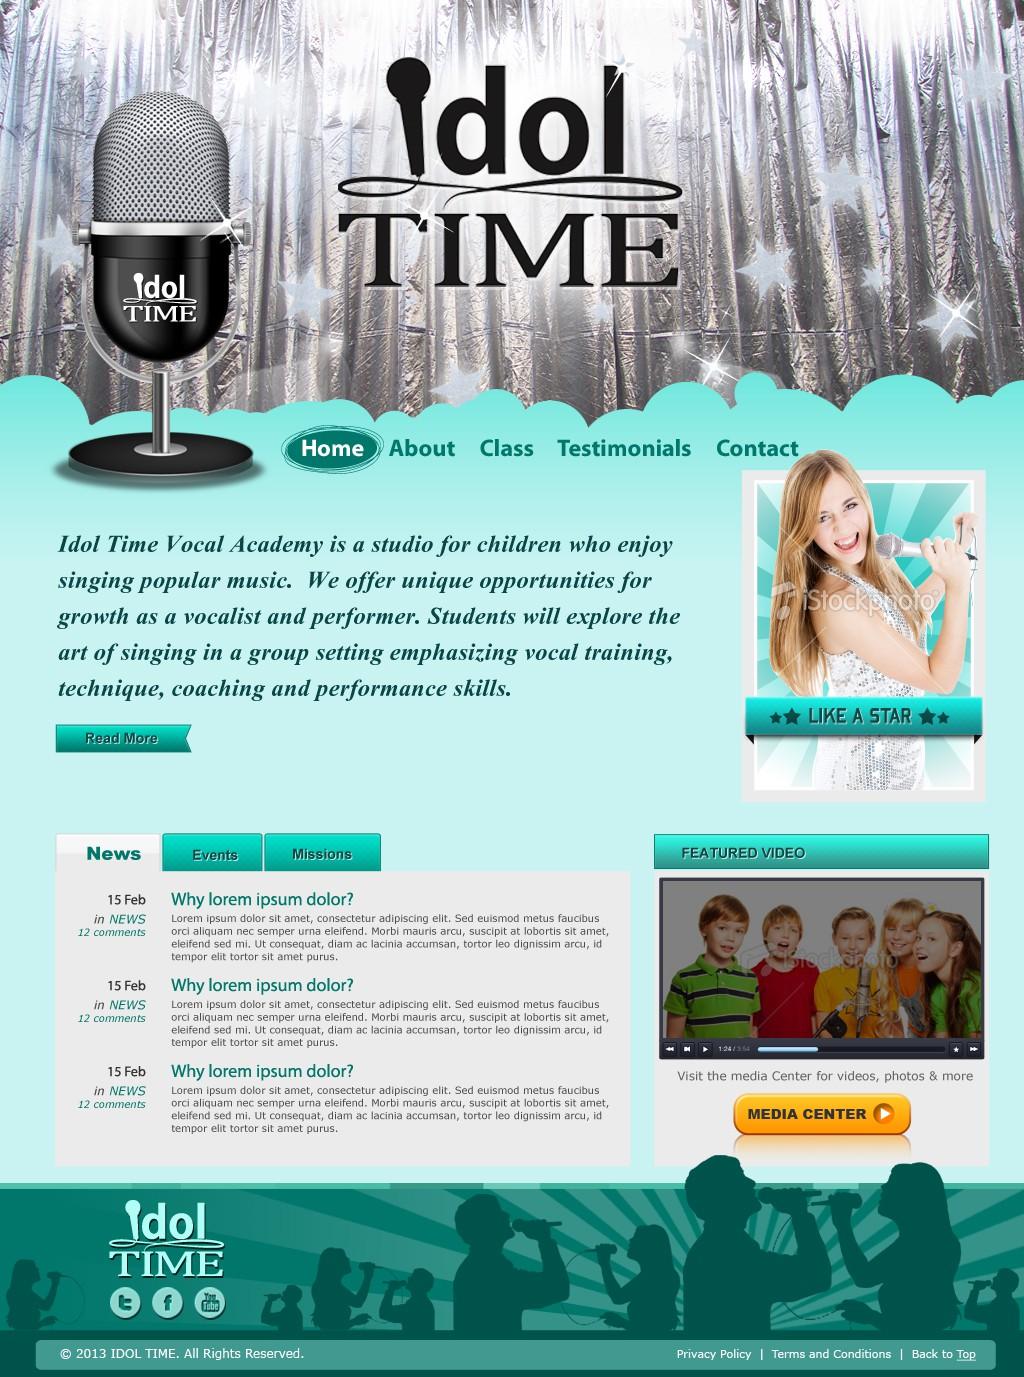 website design for Idol Time Vocal Academy